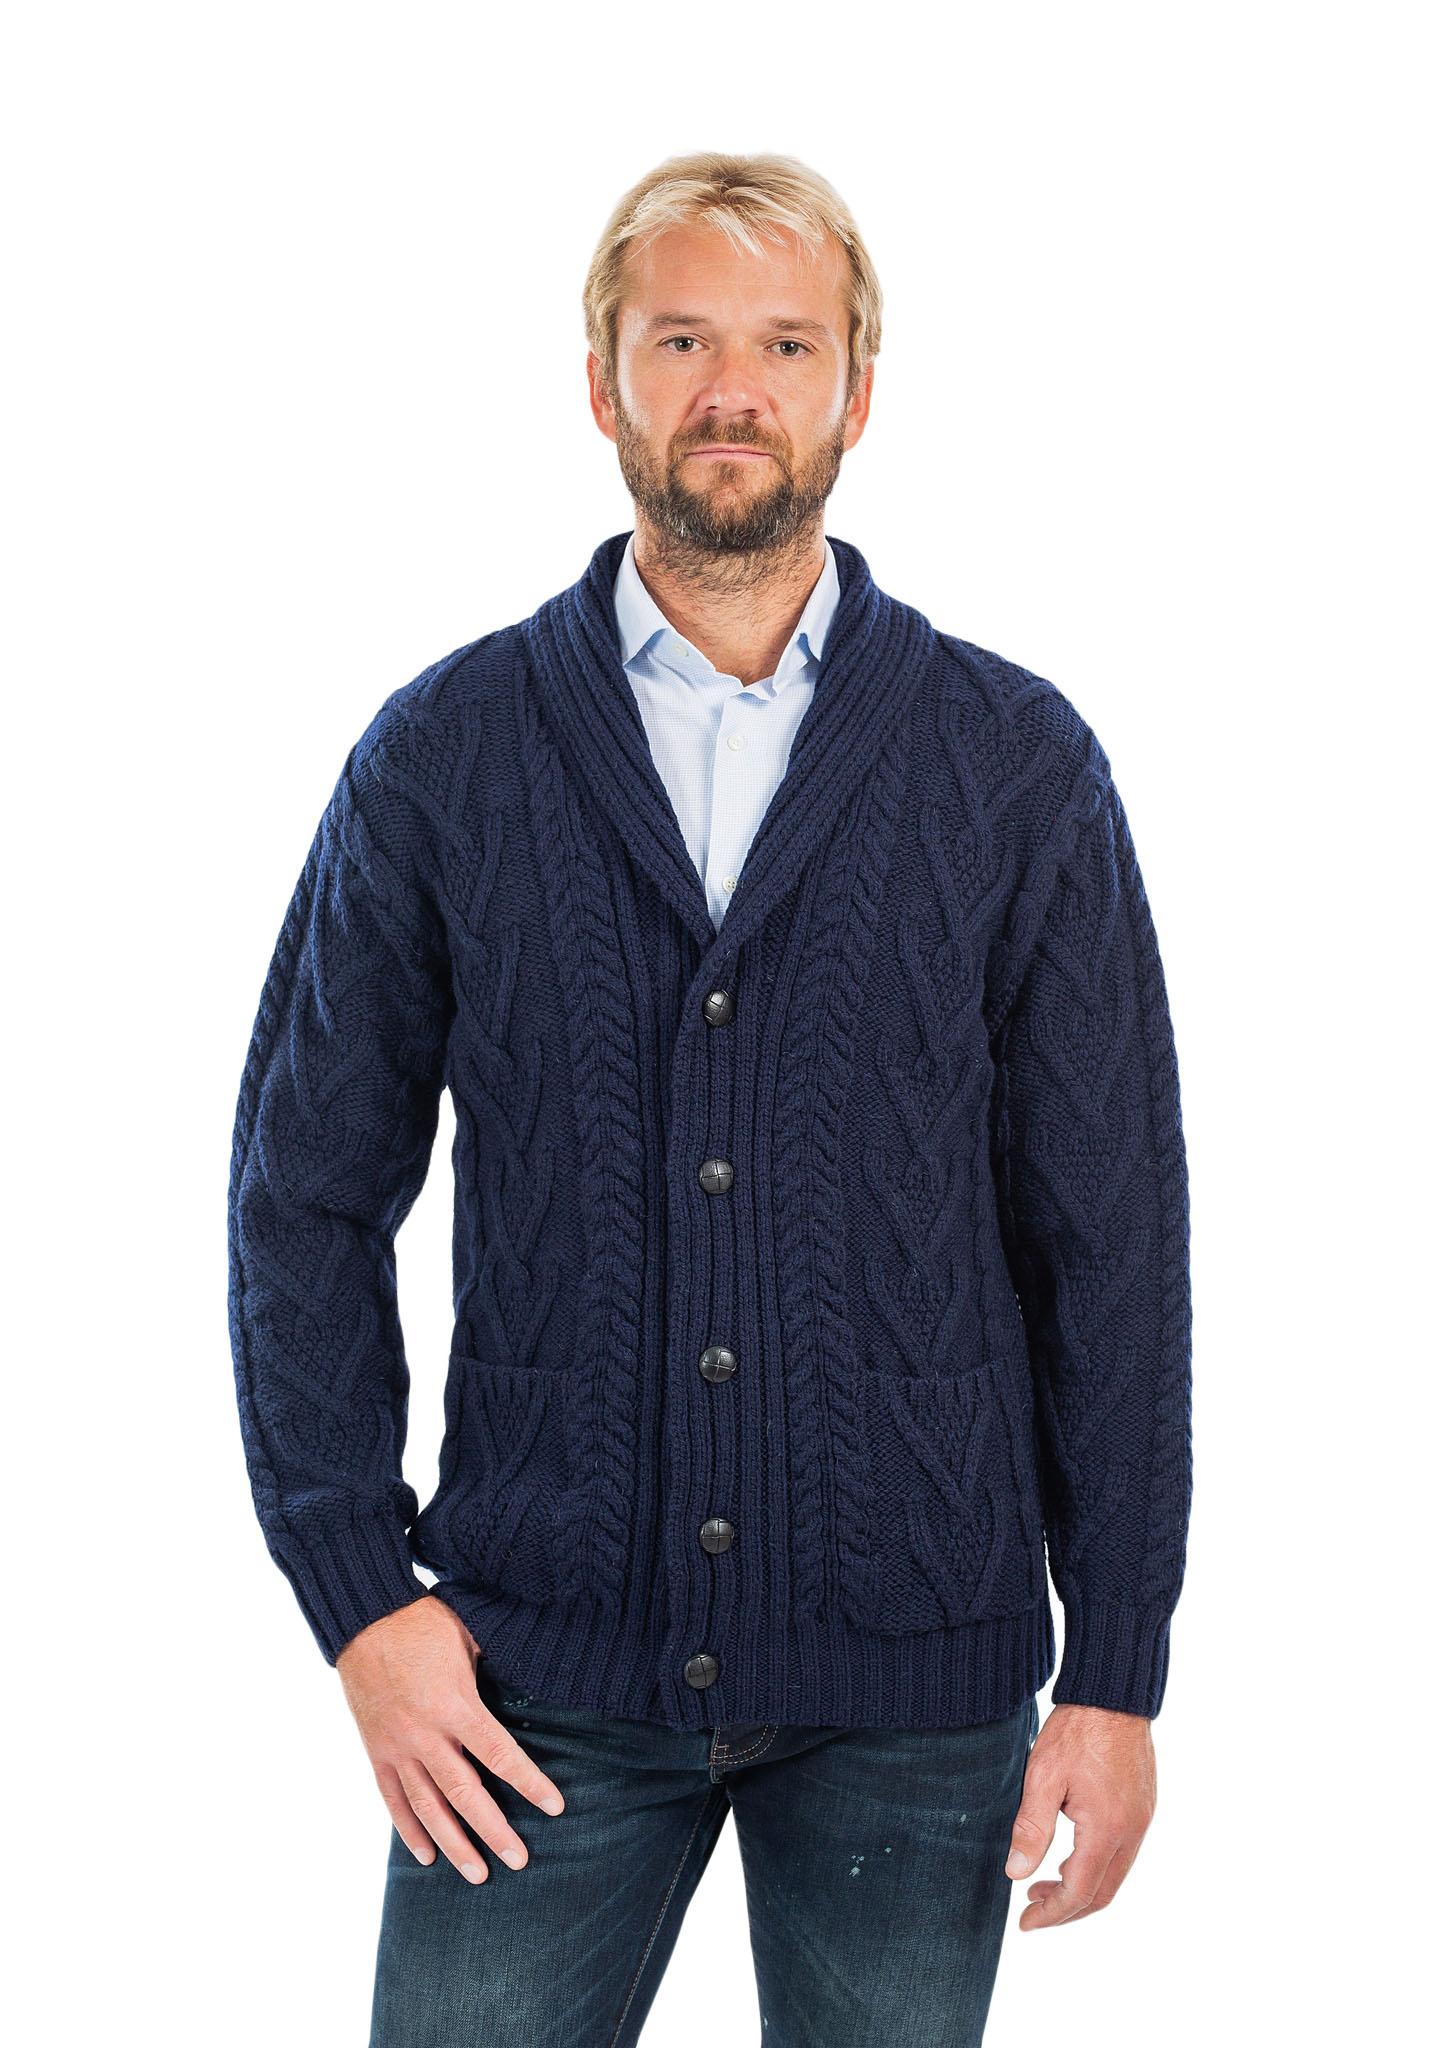 SAOL-Mens-Irish-Merino-Wool-Cardigan-Shawl-Collar-Front-Pockets-Aran-Cable-Knit thumbnail 24